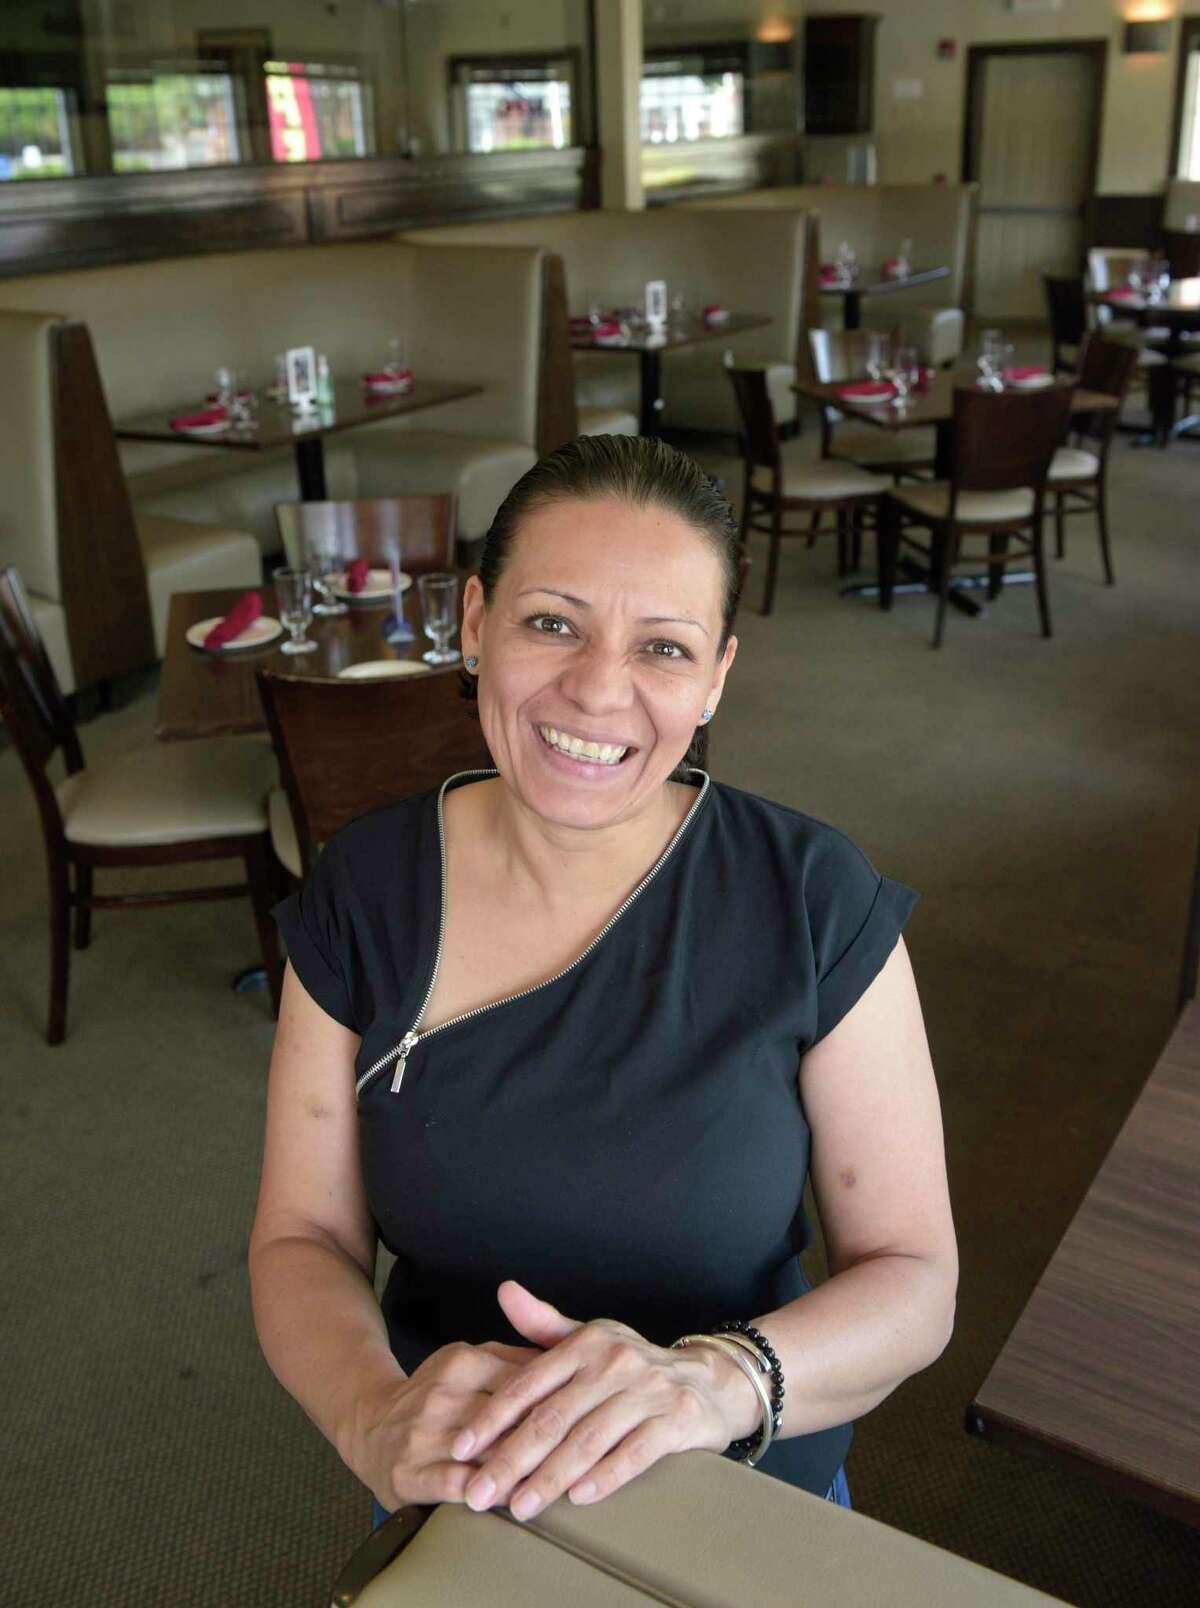 Nancy Mejia, owner, D'Arcos restaurant in Bethel, Conn. Wednesday, July 28, 2021.